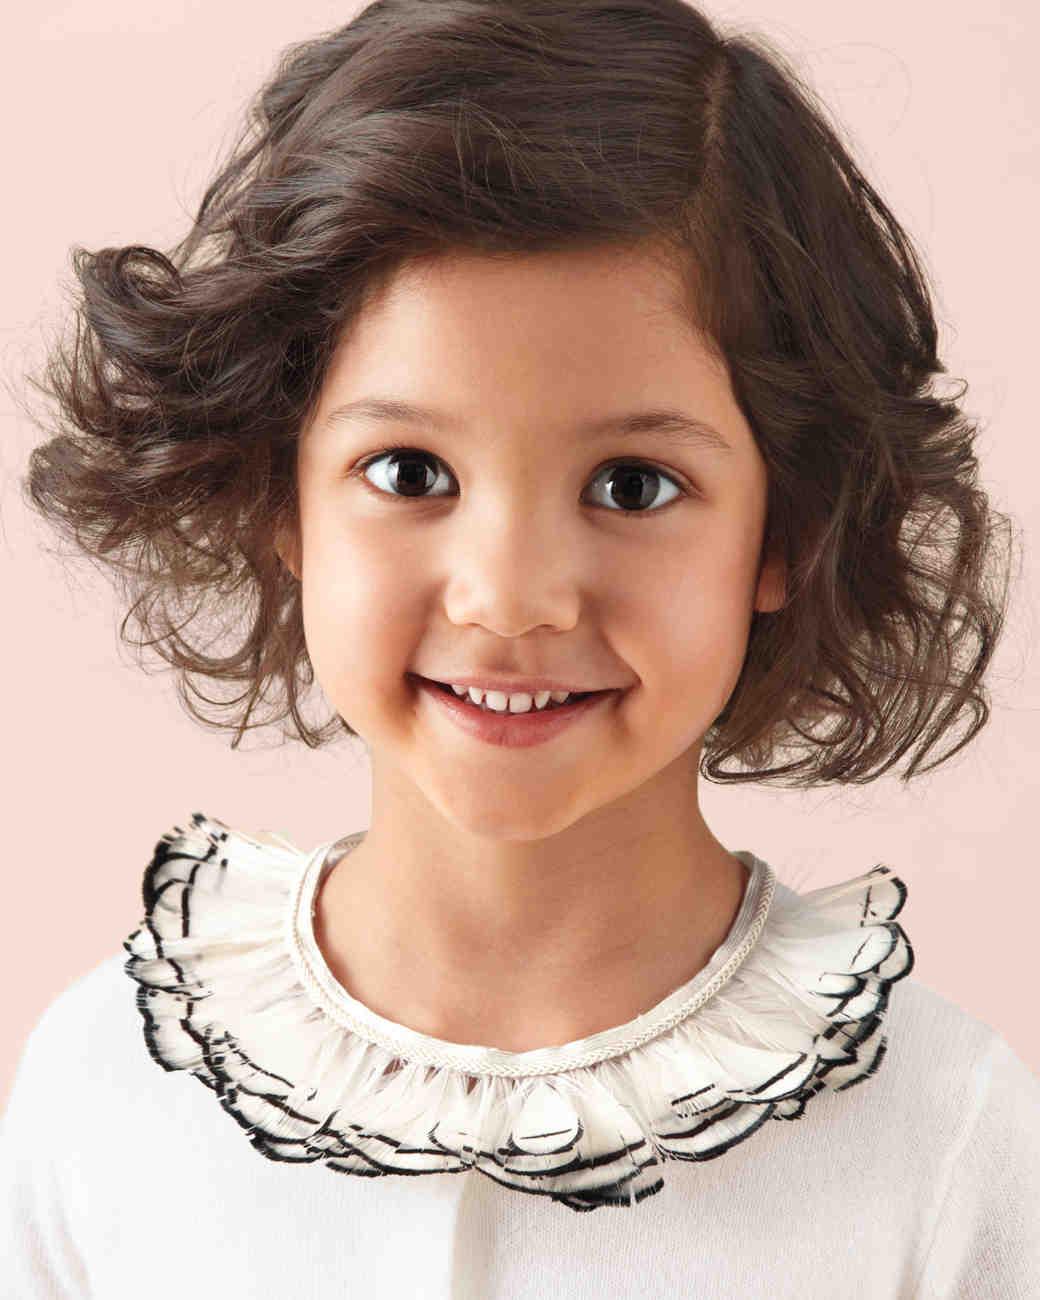 collar-feather-model-yk-437-mwd110177.jpg